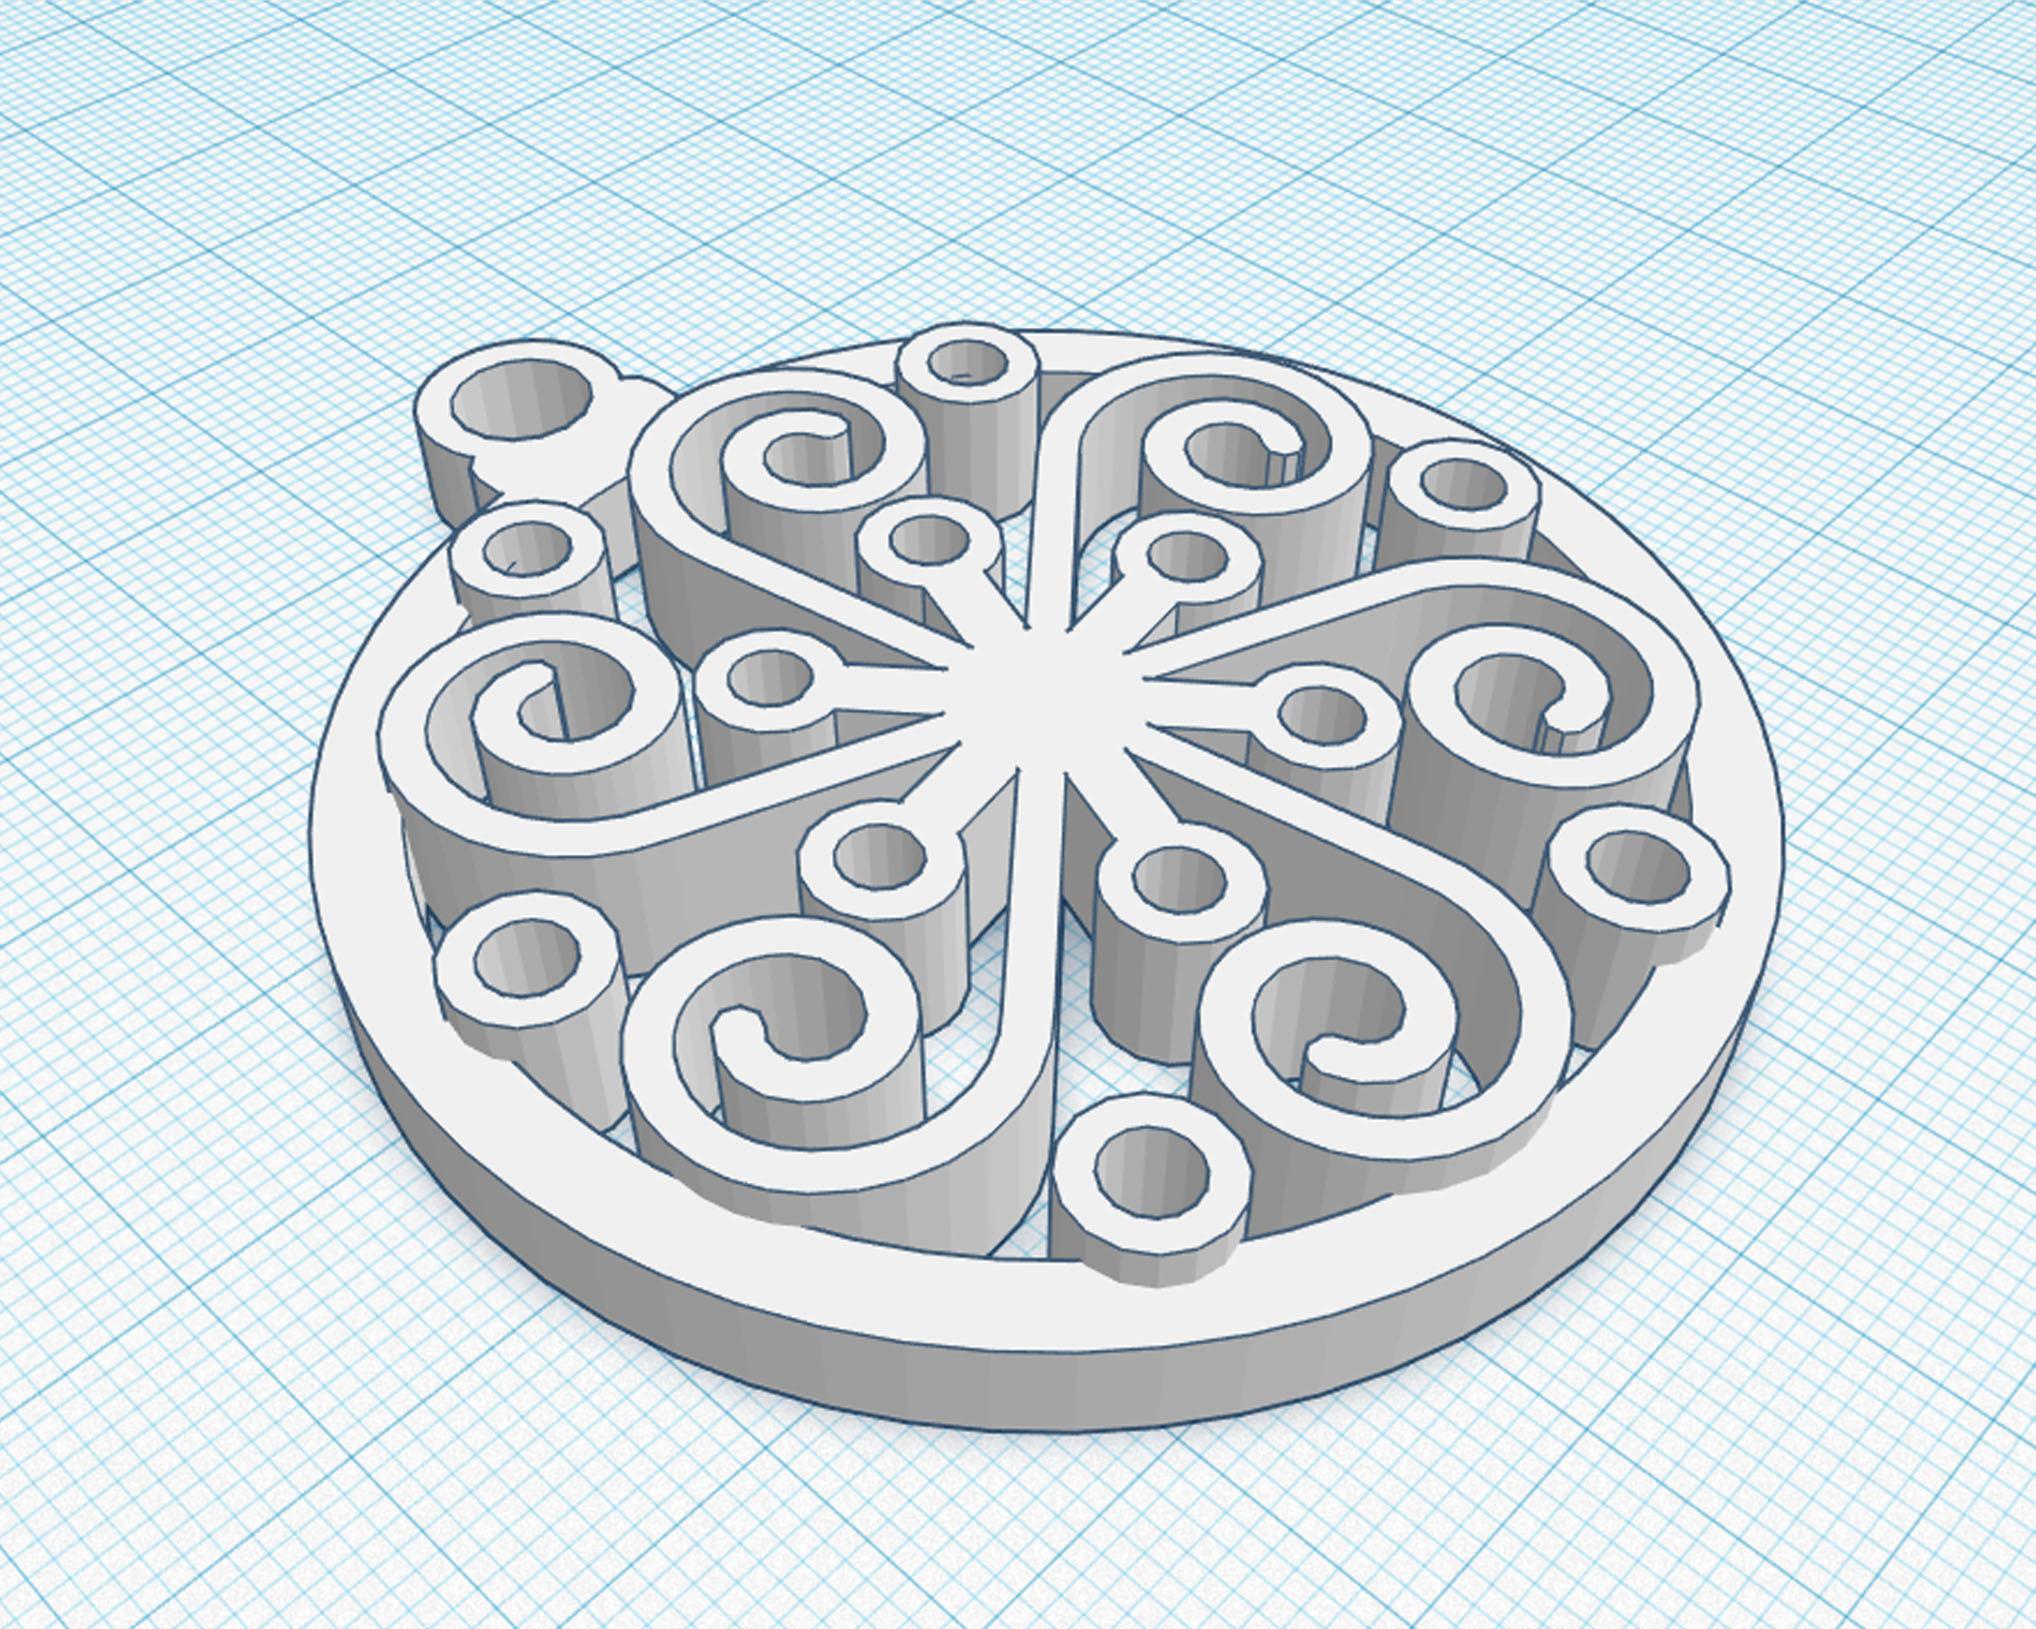 4.jpg Download OBJ file Ornamental Sphere • 3D printable design, cristoferespinozat